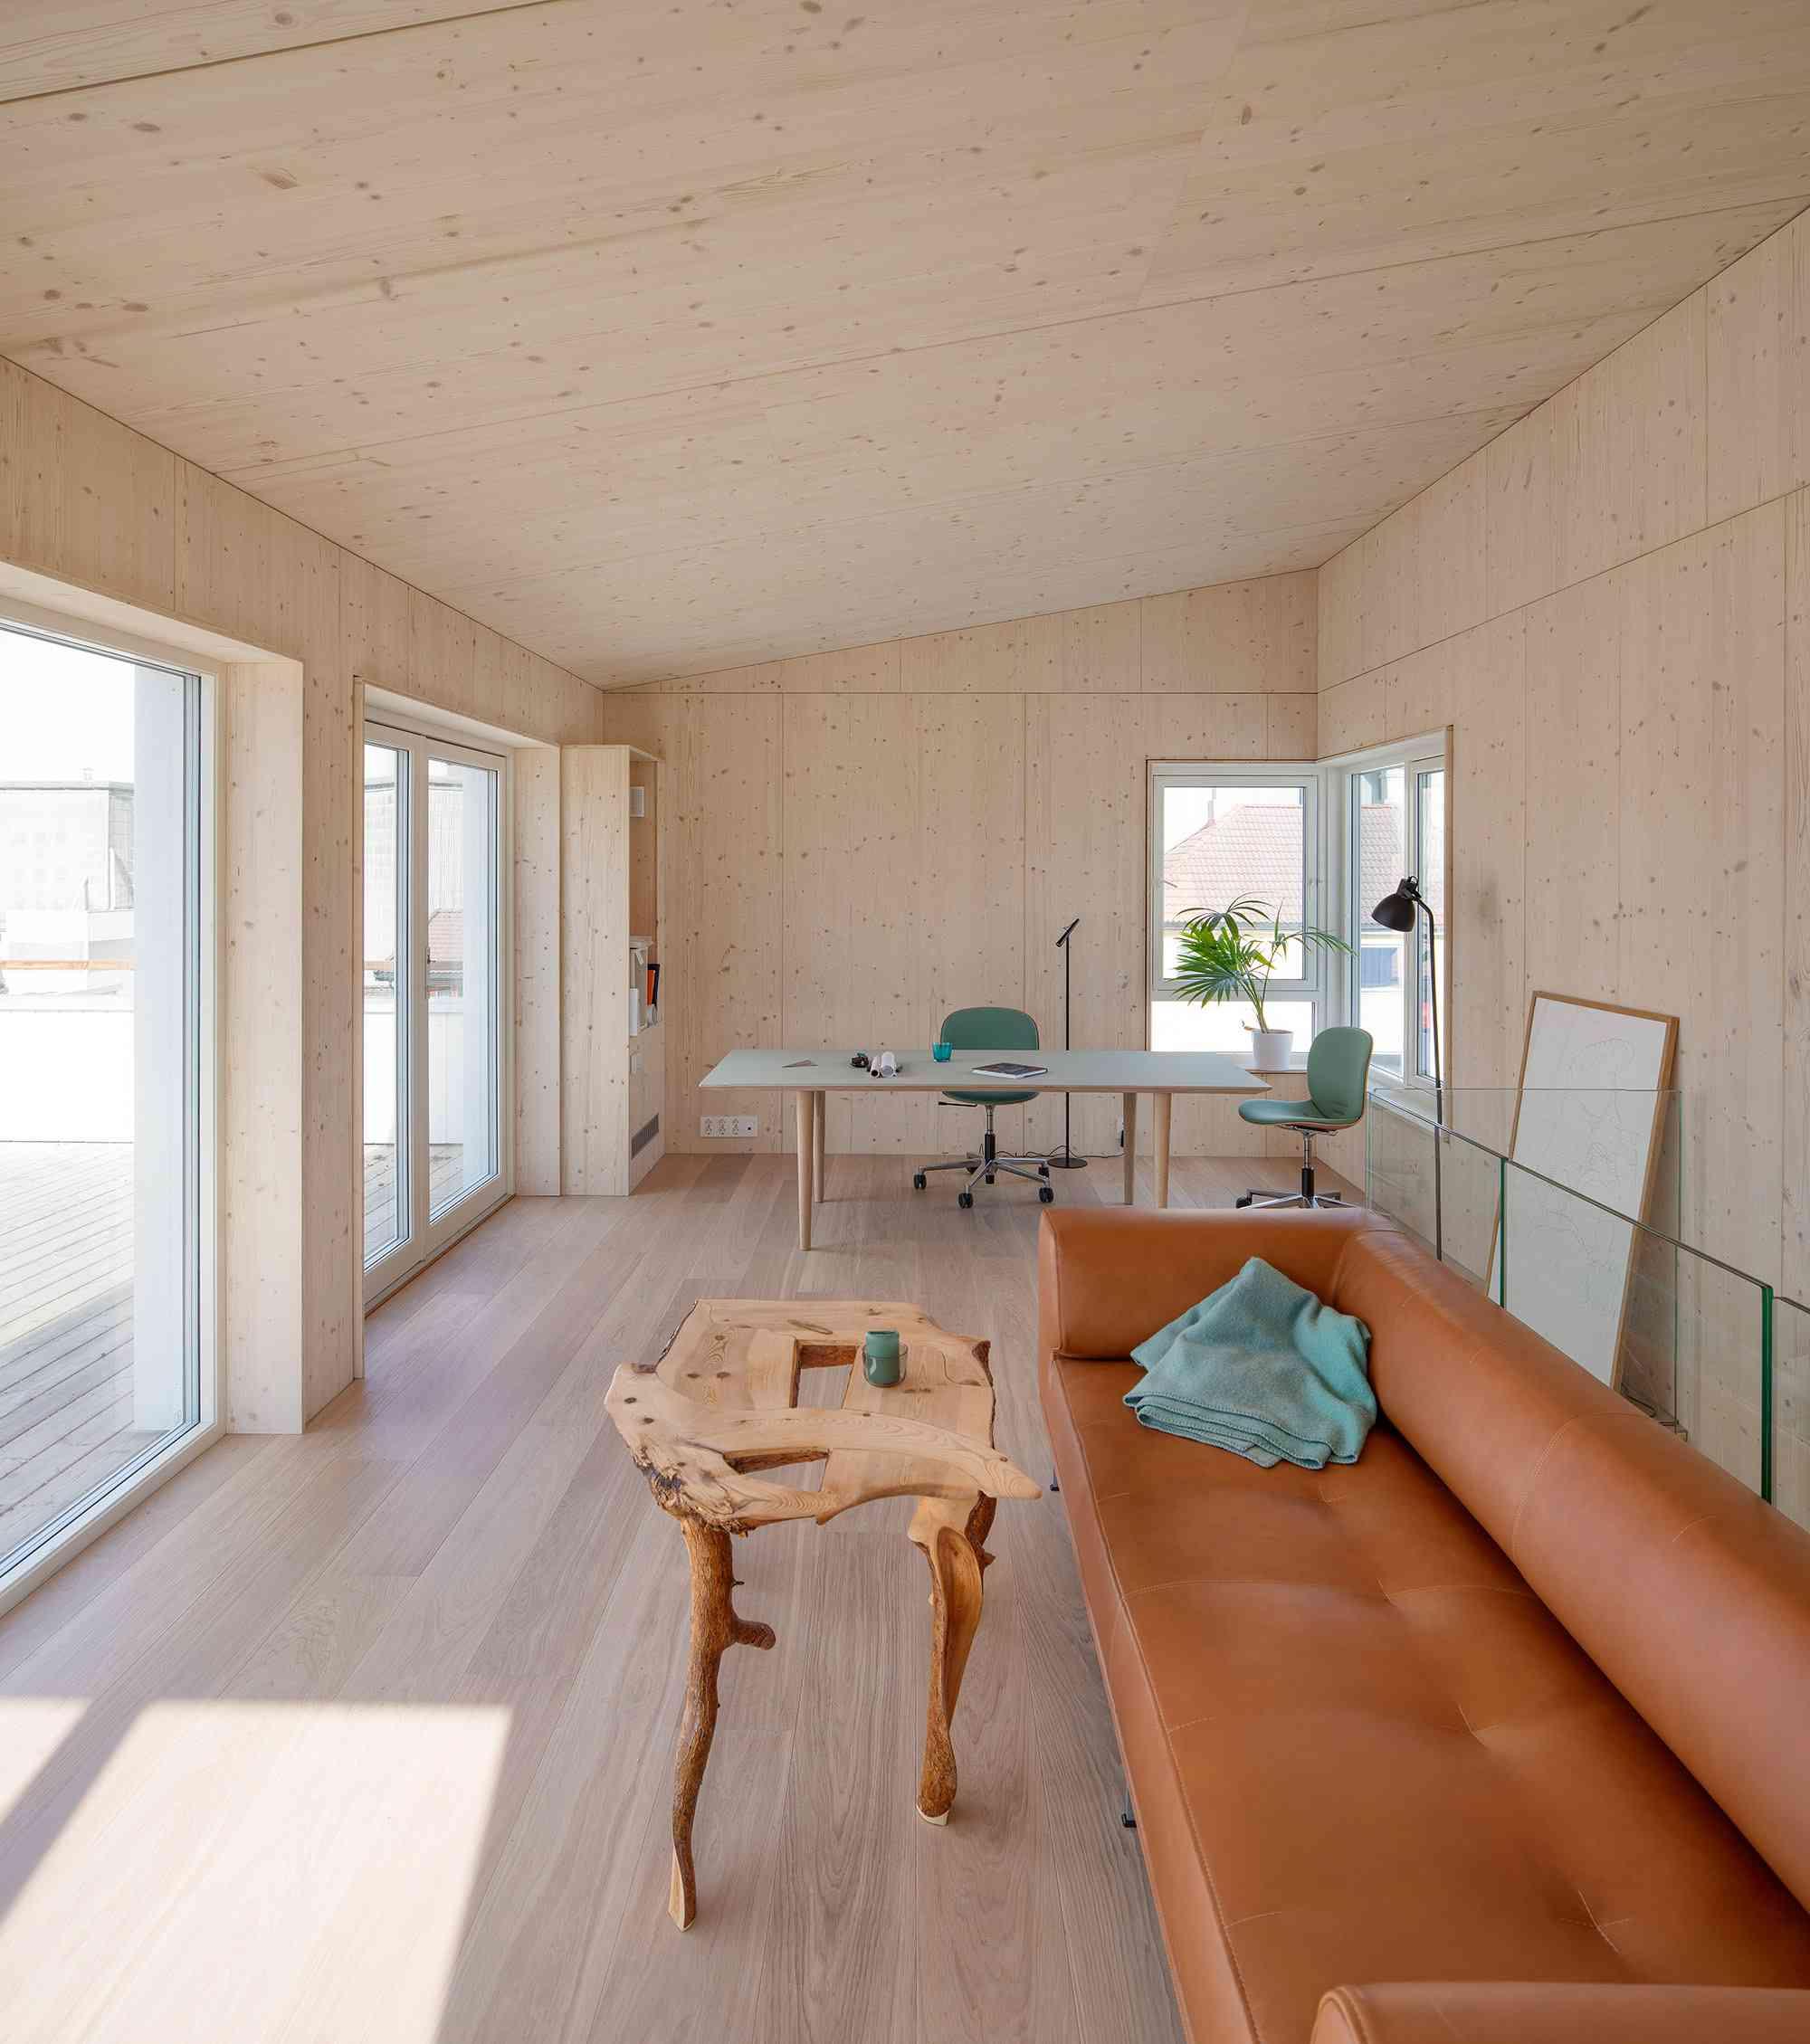 Vindmøllebakken Cohousing Project by Helen & Hard Architects interior of unit